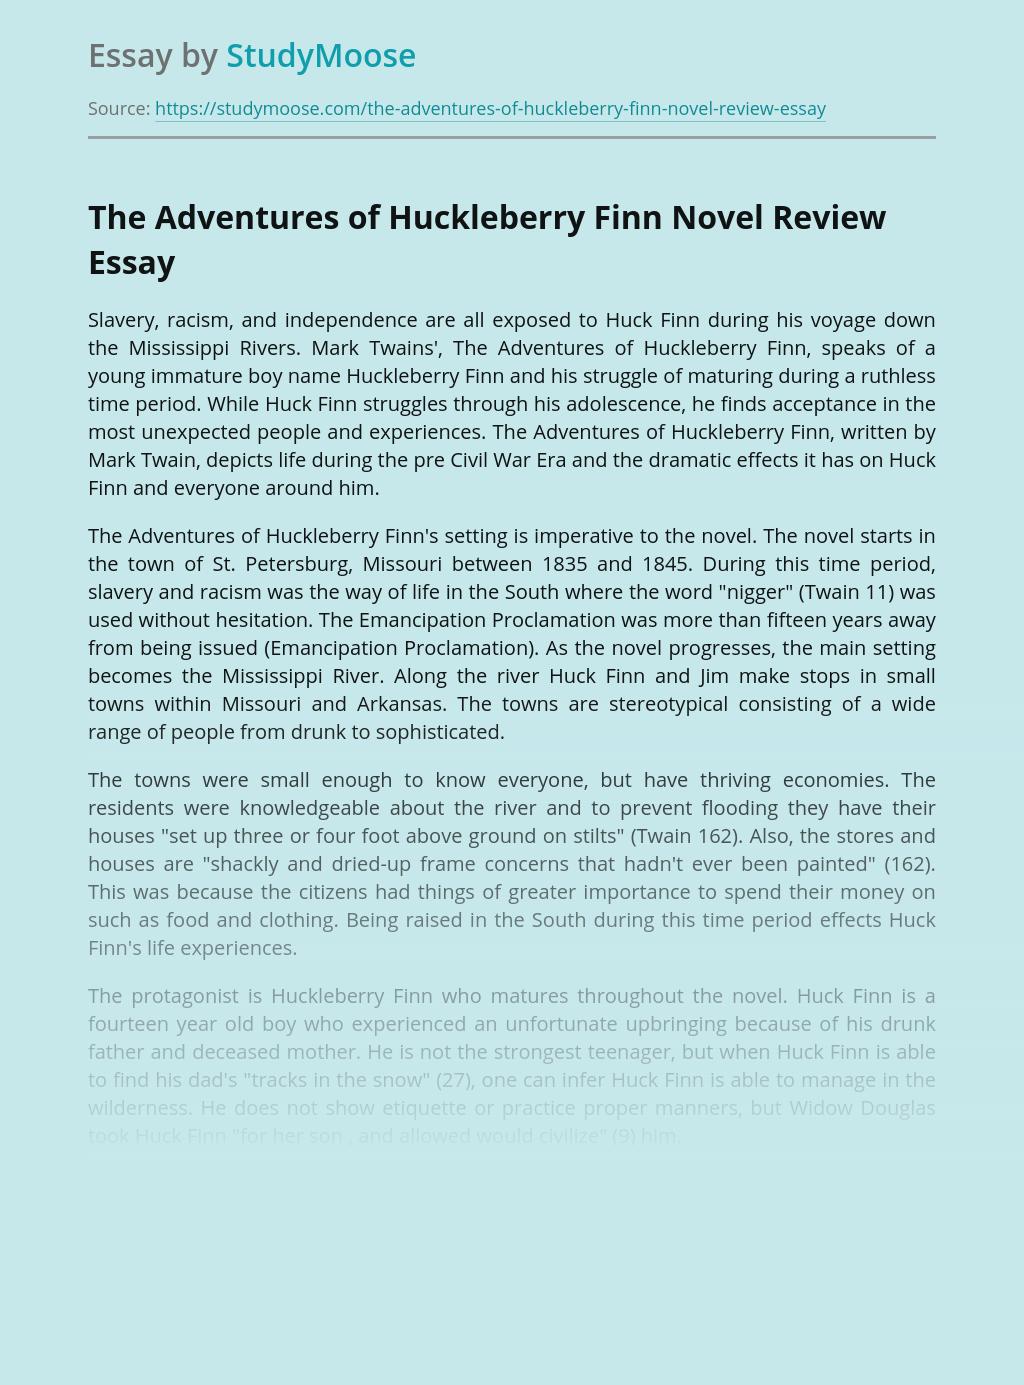 The Adventures of Huckleberry Finn Novel Review